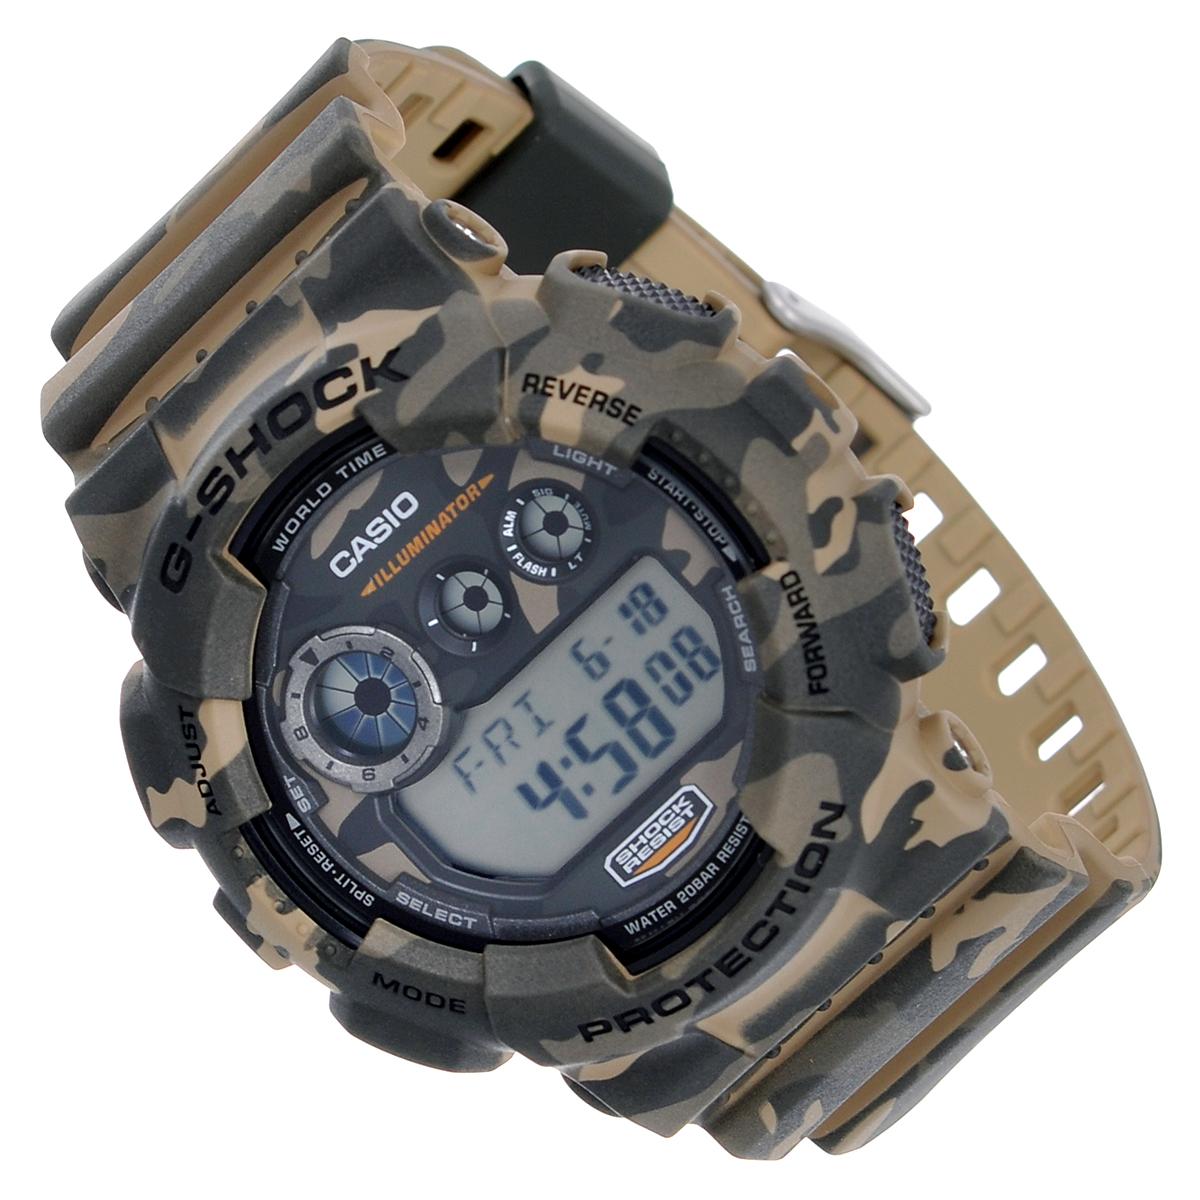 Часы мужские наручные Casio G-Shock, цвет: серый, камуфляж. GD-120CM-5E наручные часы casio gd 120cm 5e